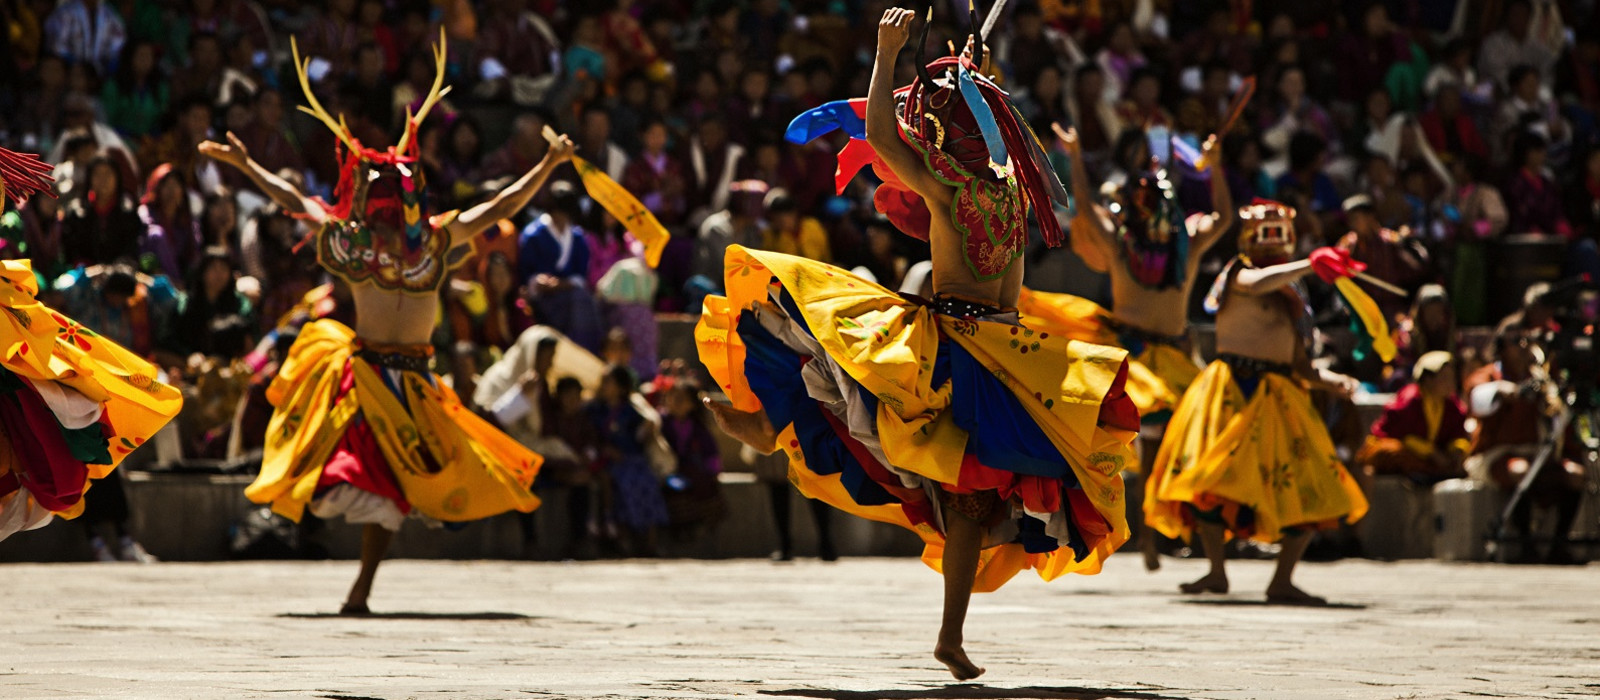 Luxury Bhutan and Thailand Paradise Islands Tour Trip 1